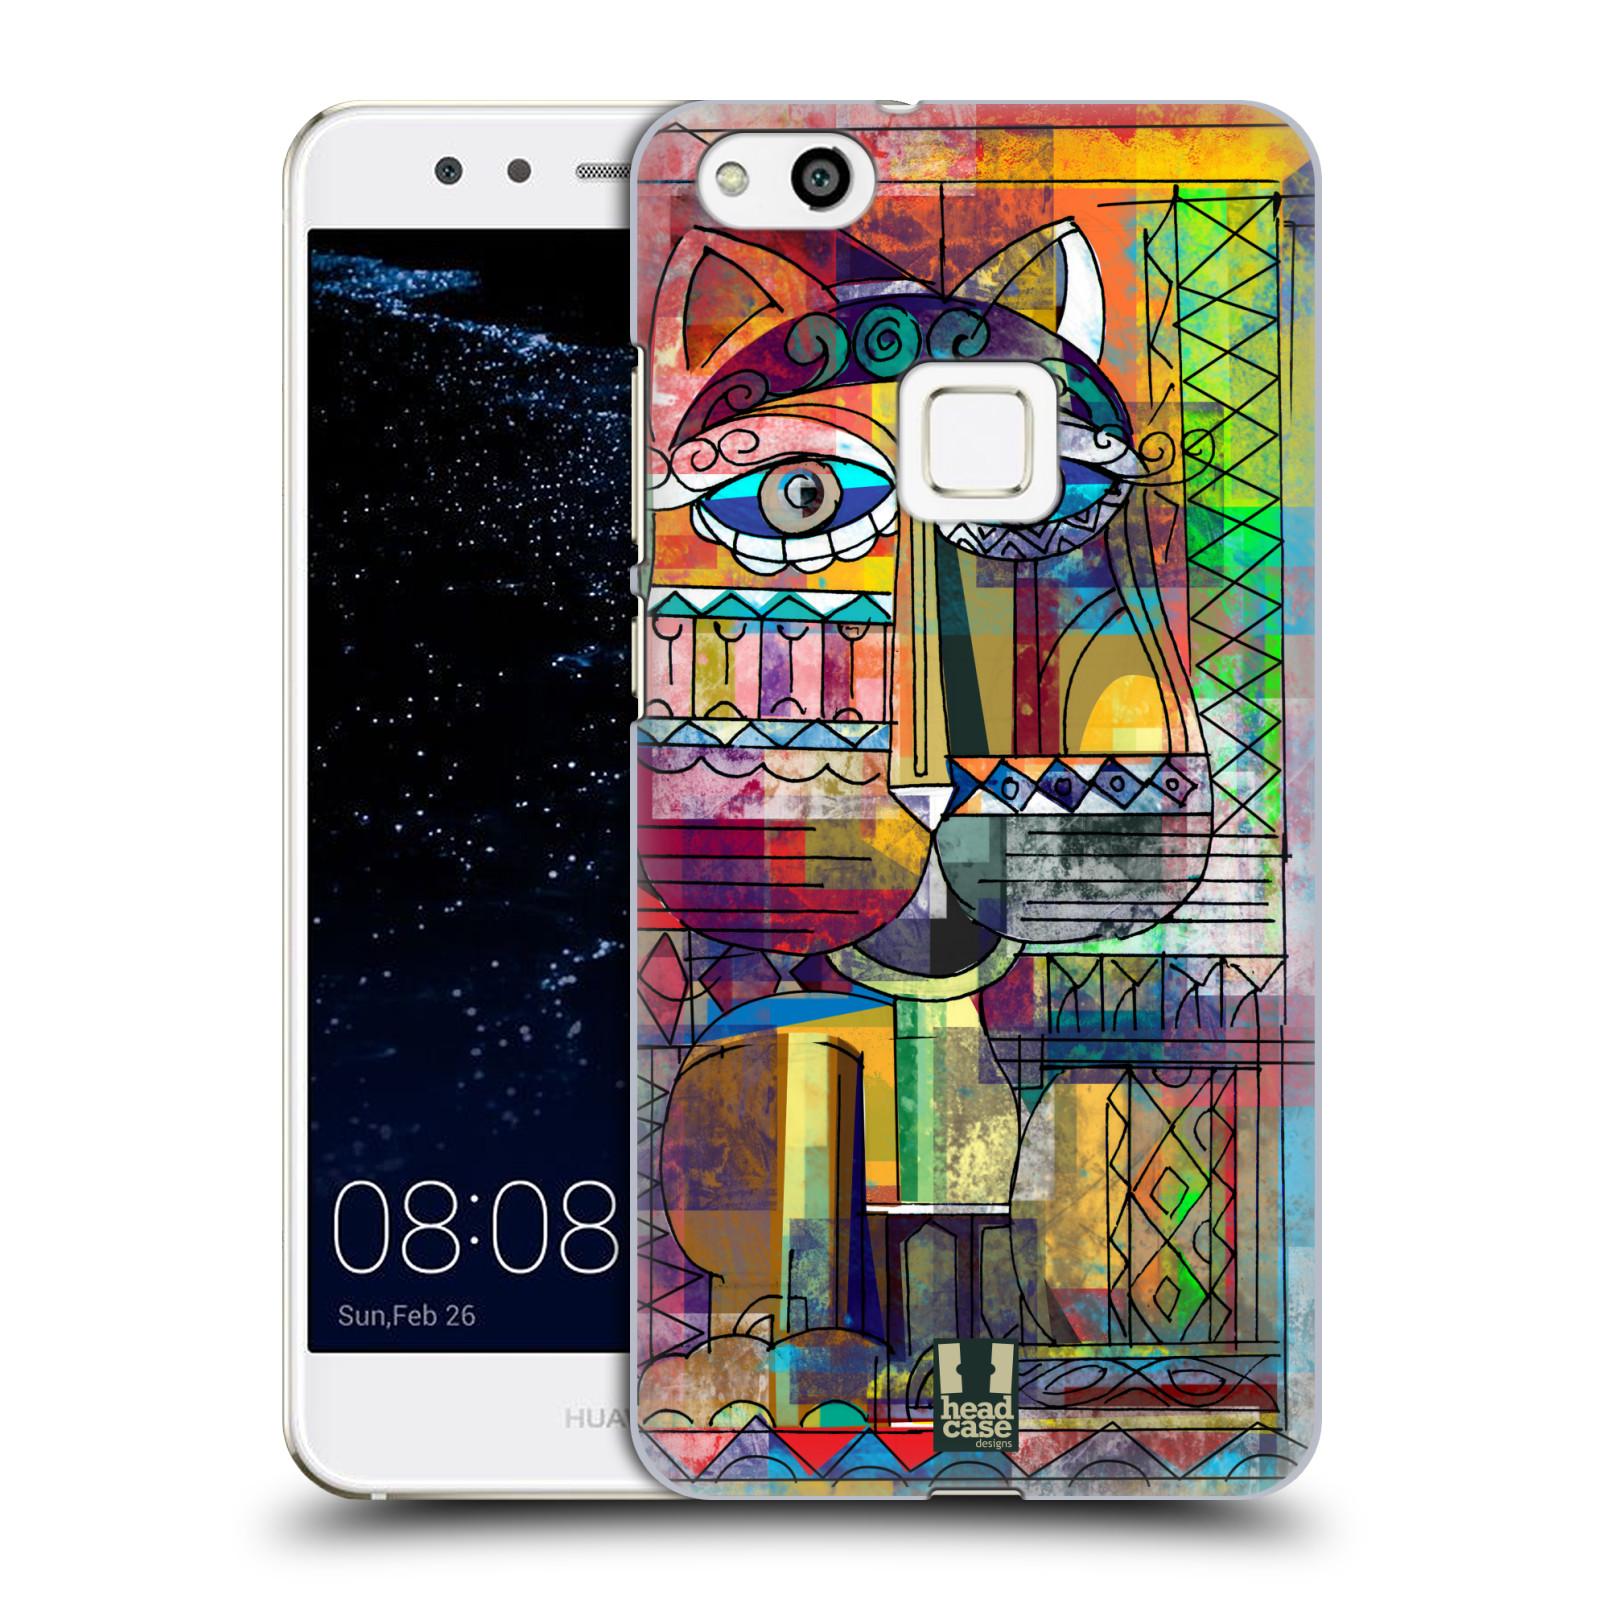 Plastové pouzdro na mobil Huawei P10 Lite Head Case - AZTEC KORAT (Plastový kryt či obal na mobilní telefon Huawei P10 Lite Dual SIM (LX1/LX1A))